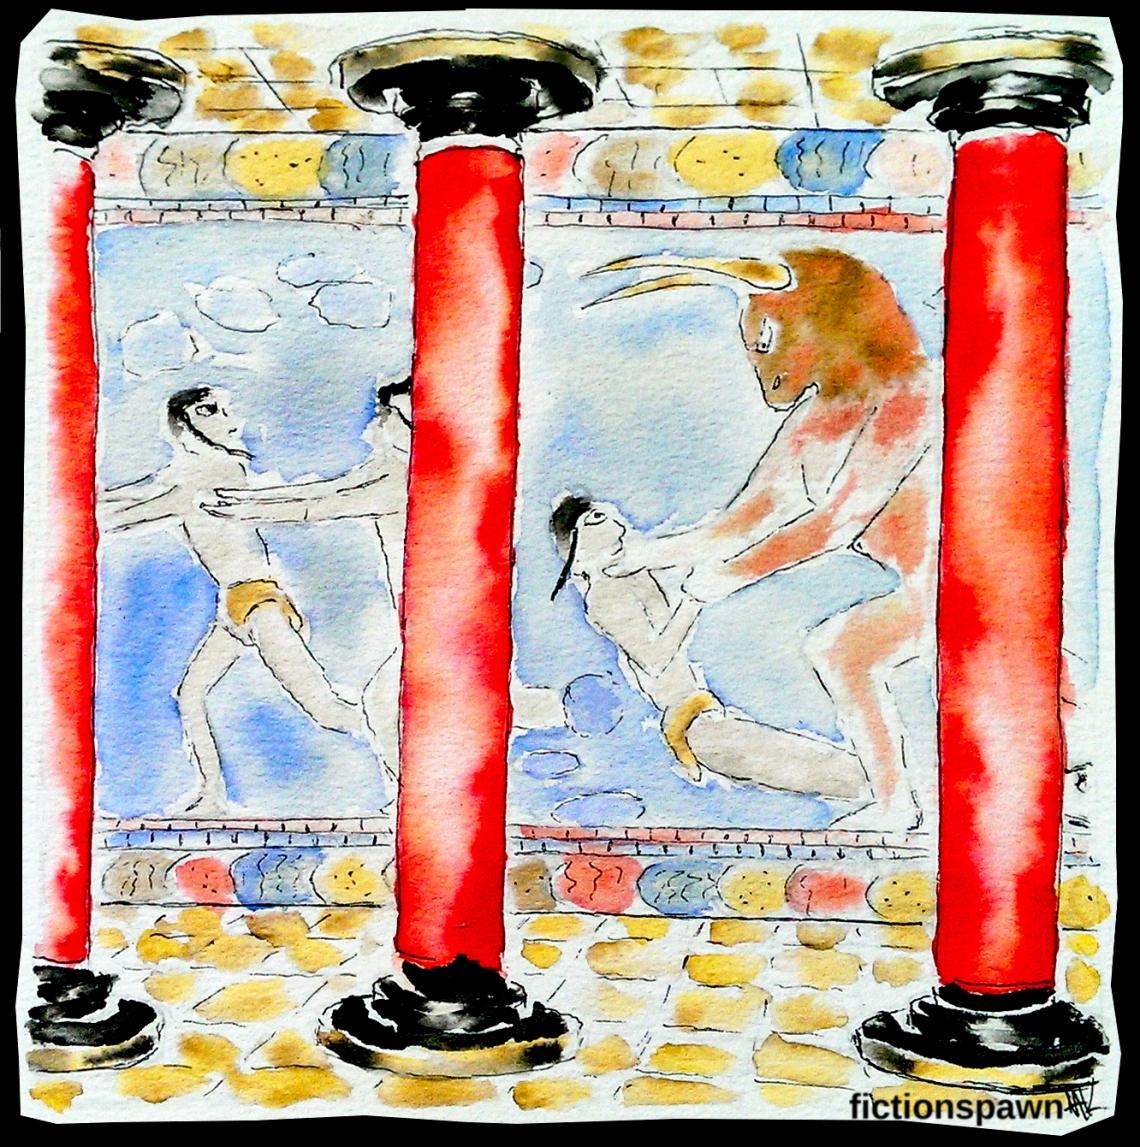 Minotaur Aak fictionspawn